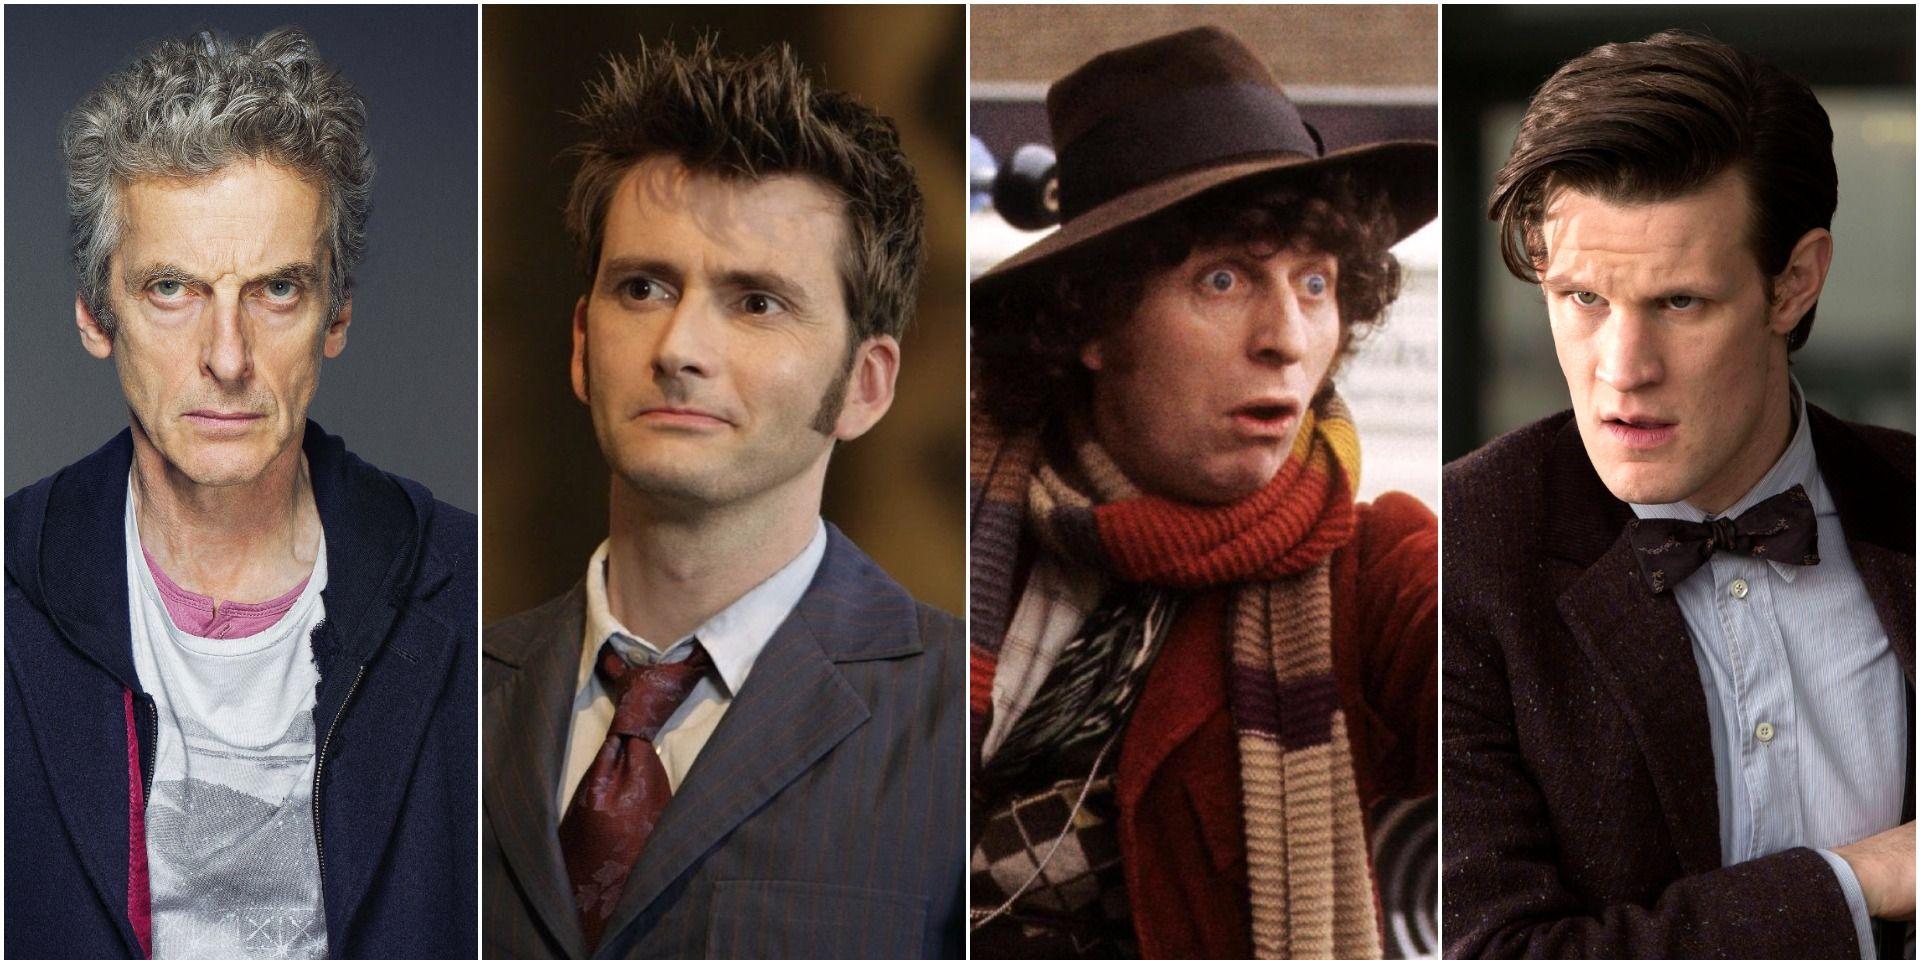 Peter Capaldi, David Tennant, Tom Baker and Matt Smith in Doctor Who